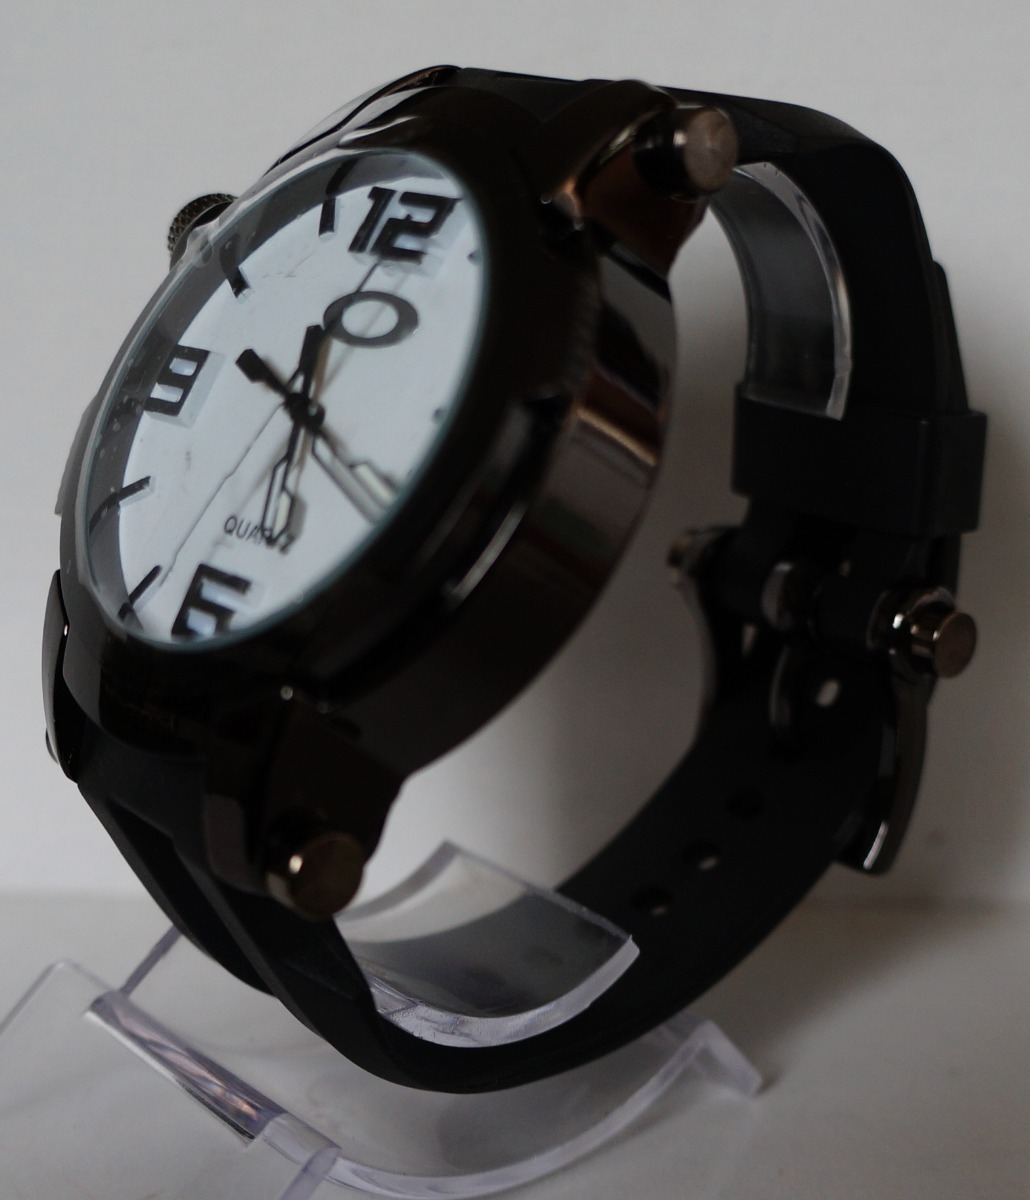 5ddd19ec545 relógio oakley titanium azul masculino + caixa. Carregando zoom.